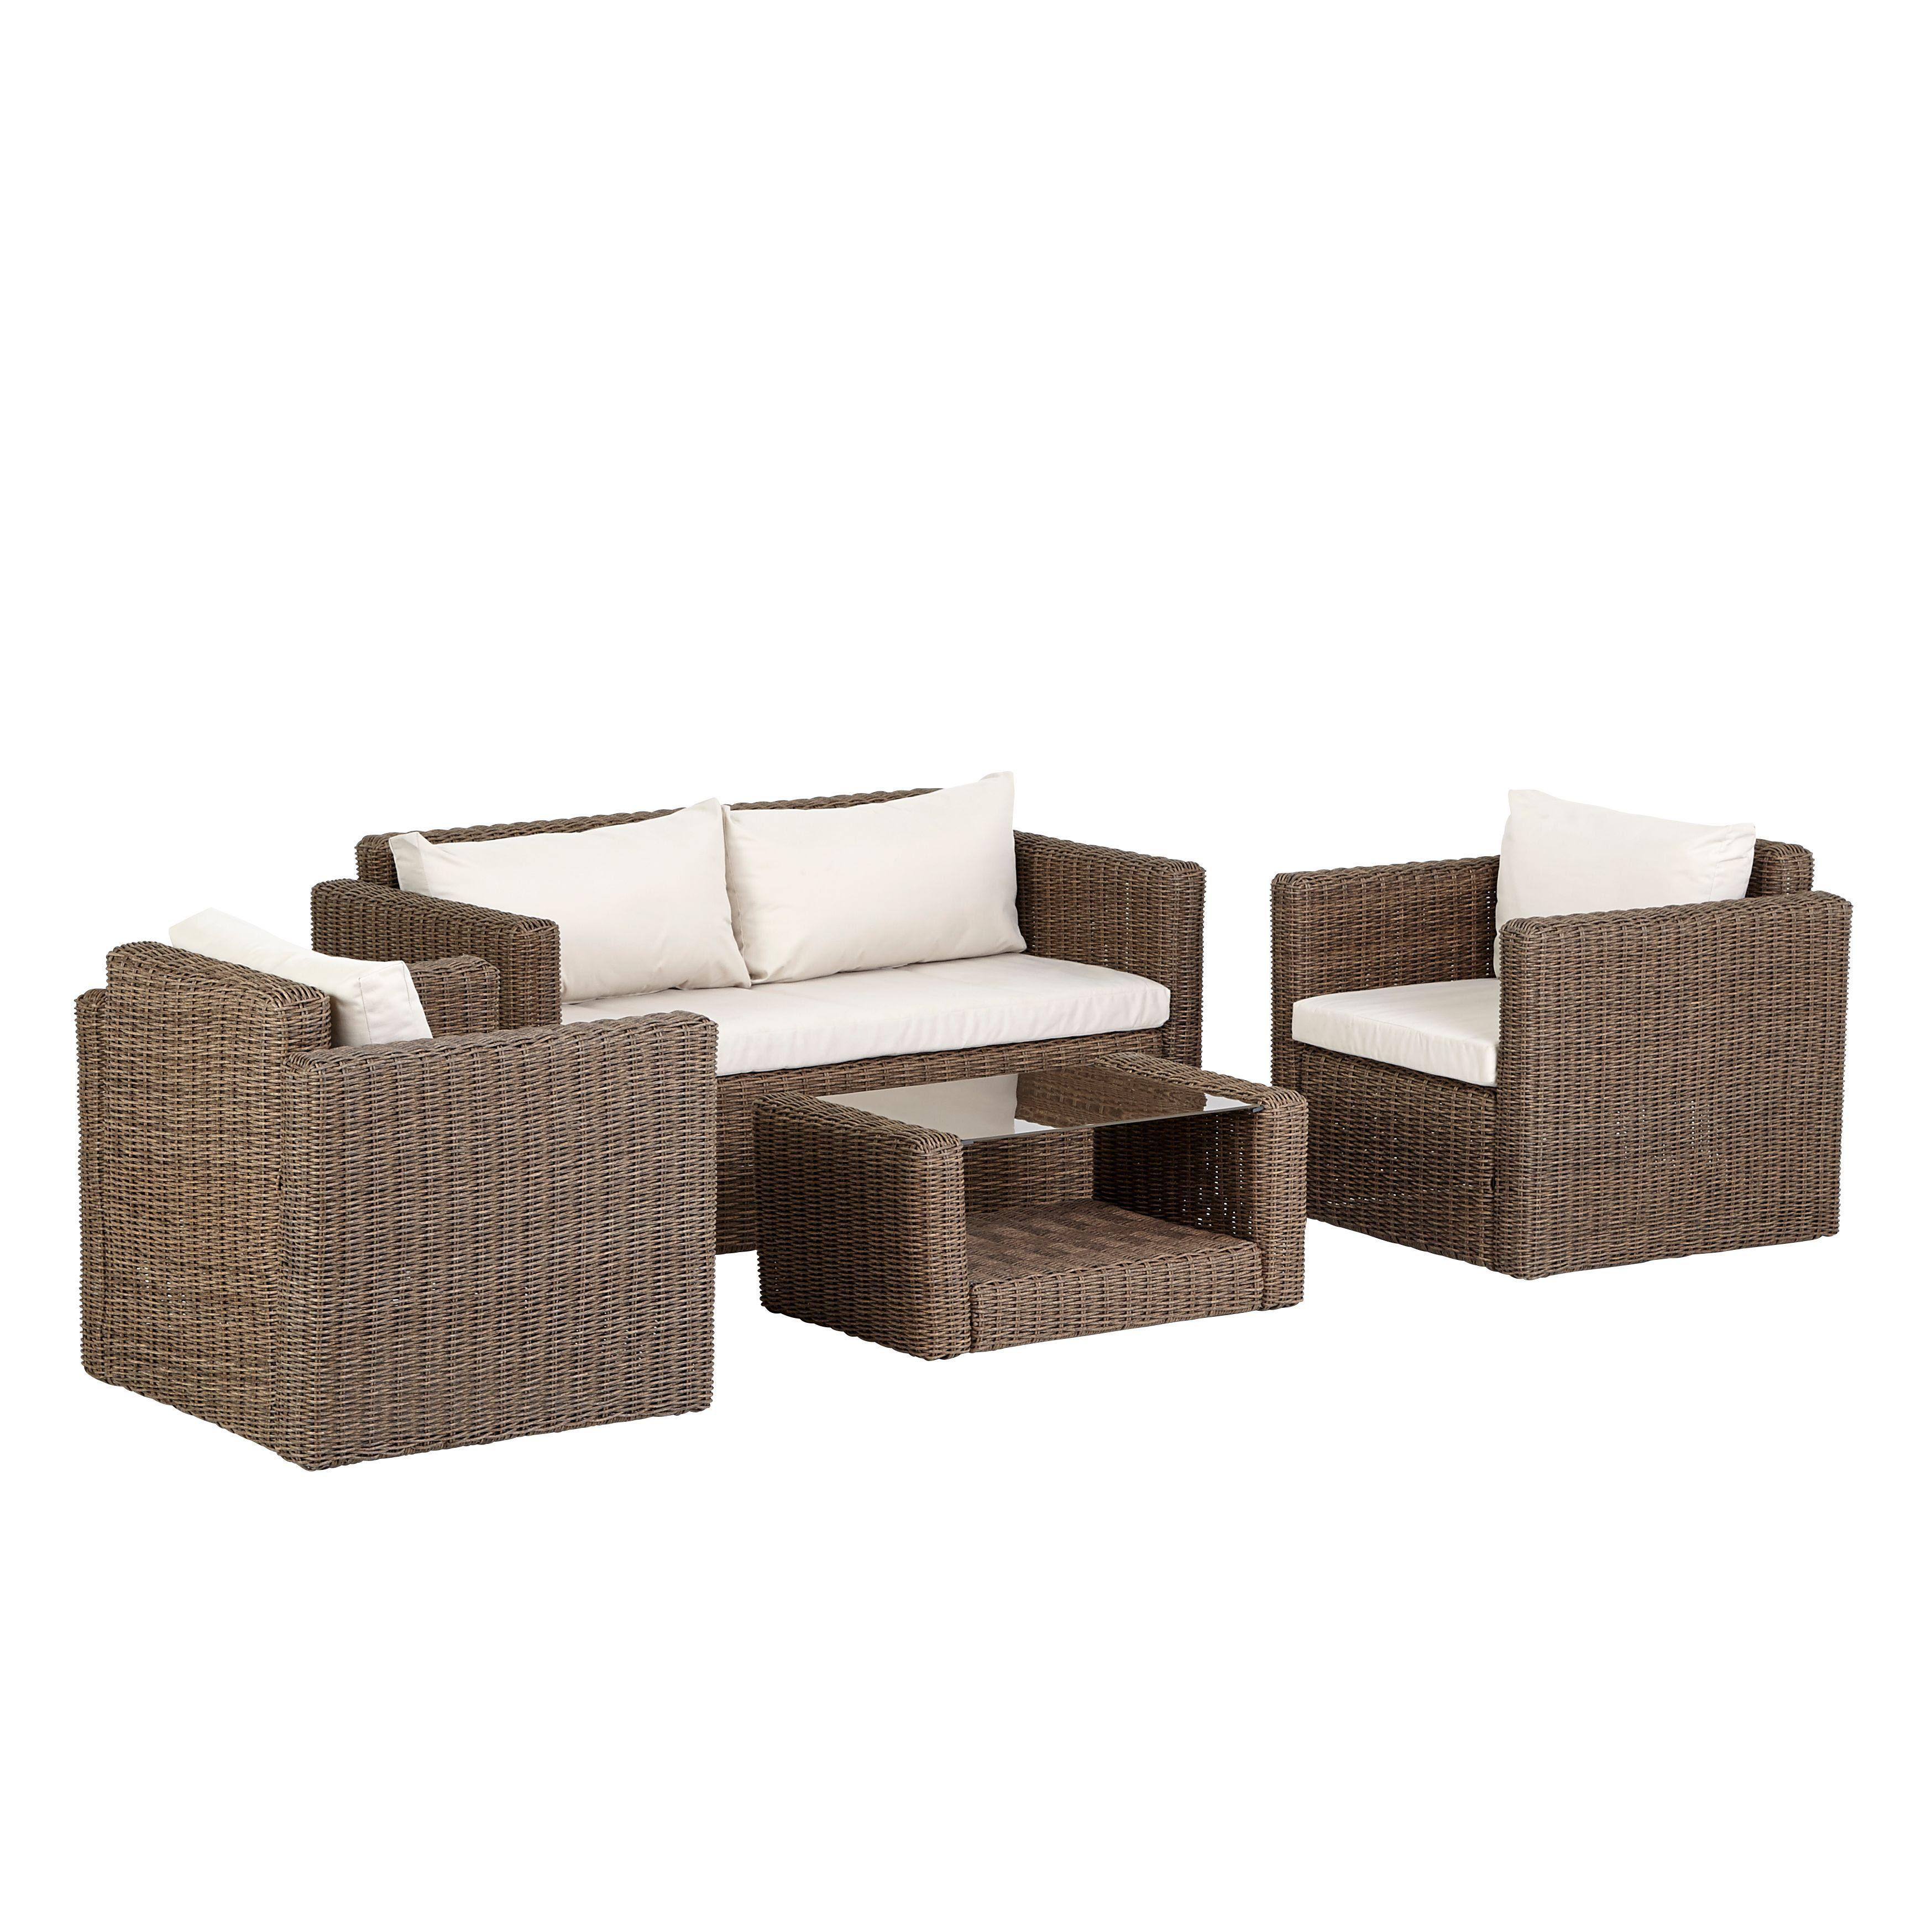 Soron Rattan Effect 4 Seater Coffee Set | Departments ...